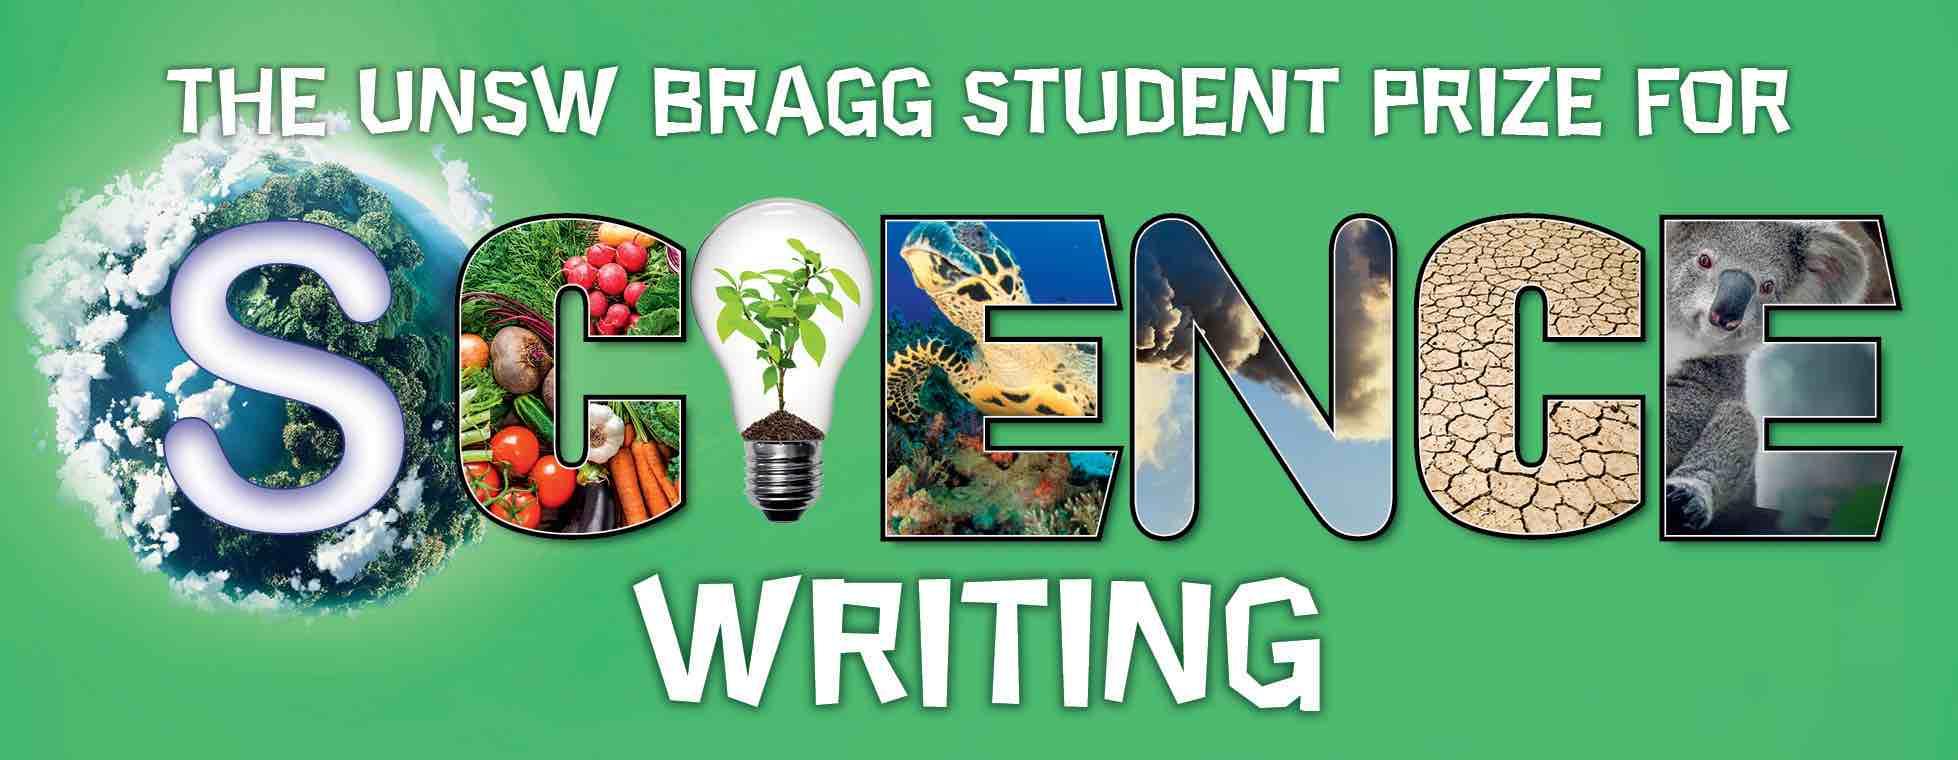 UNSW Bragg Student Prize 2017